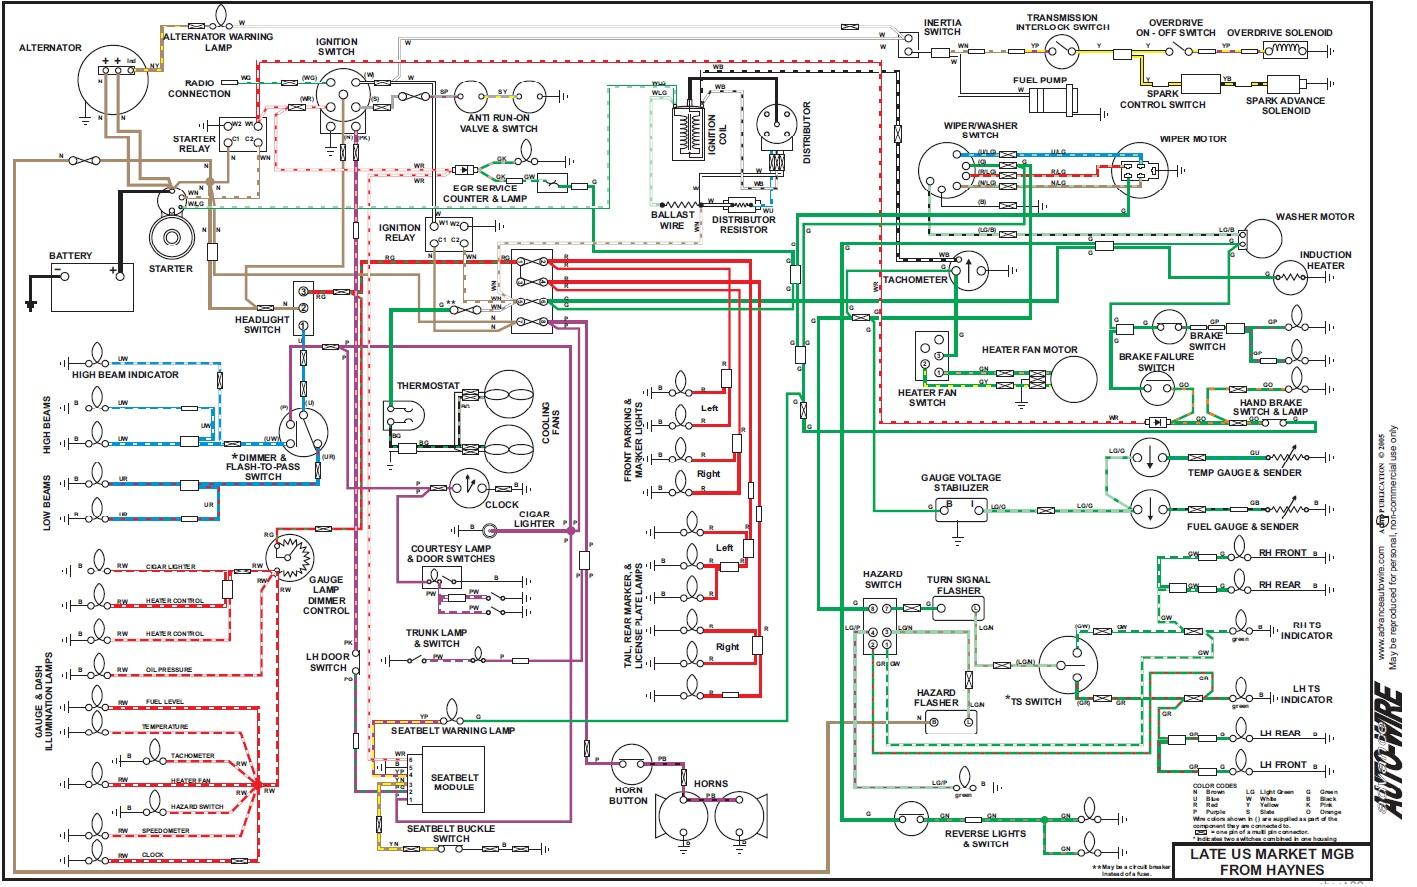 1970 Tr6 Wiring Diagrams Saturn Radio